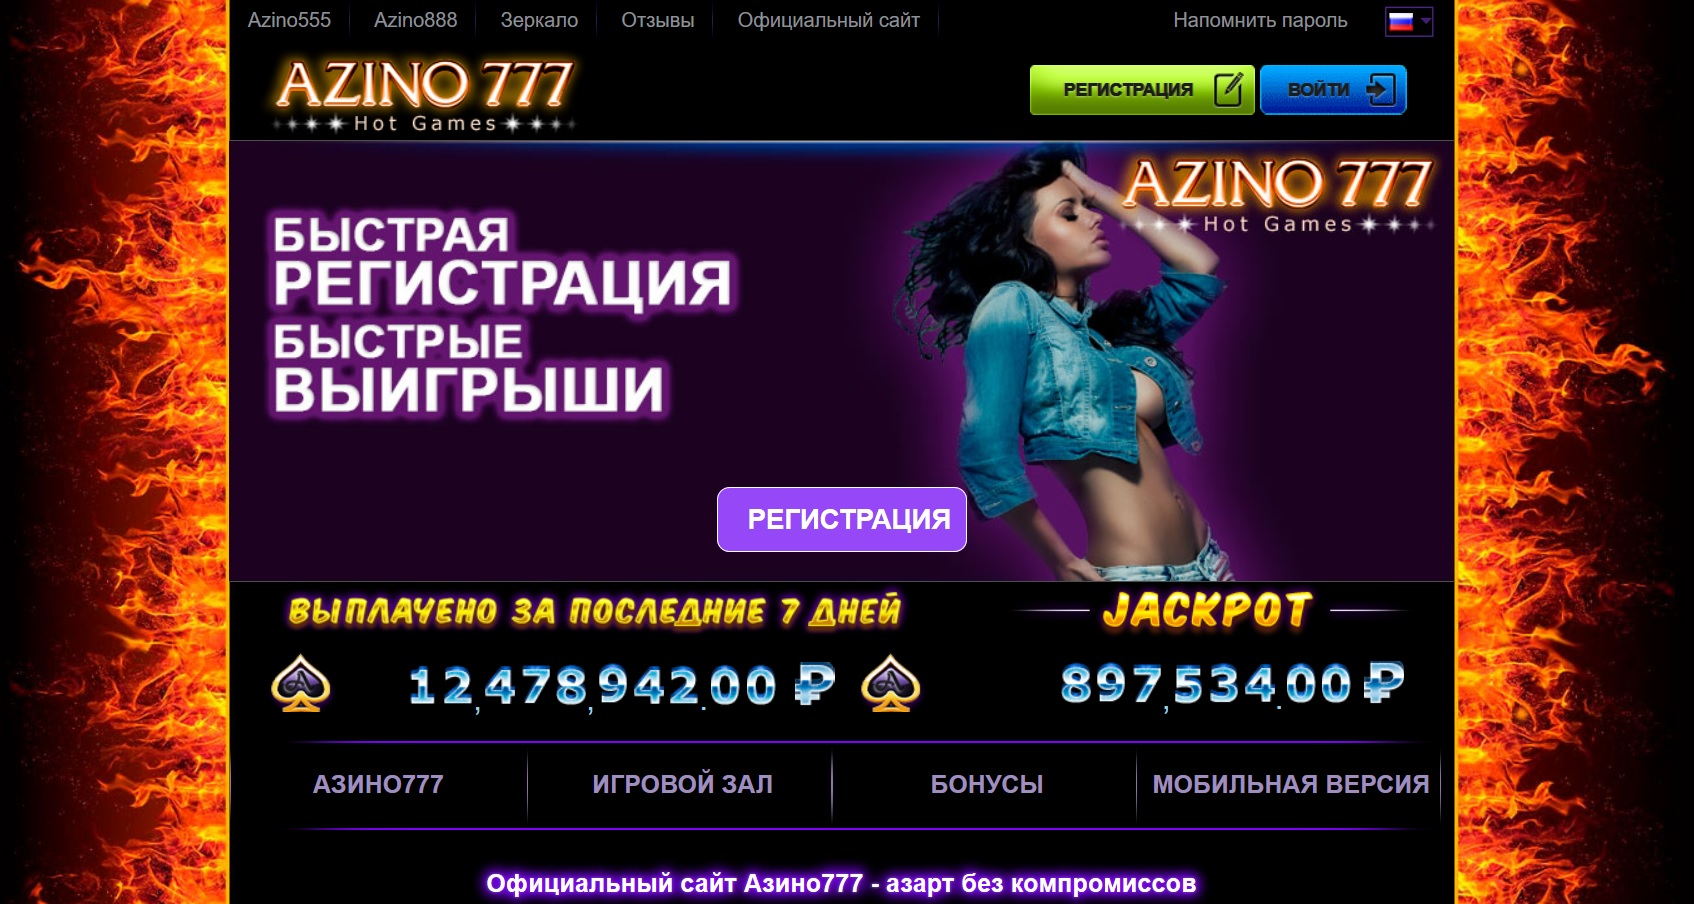 http azino777 mobi